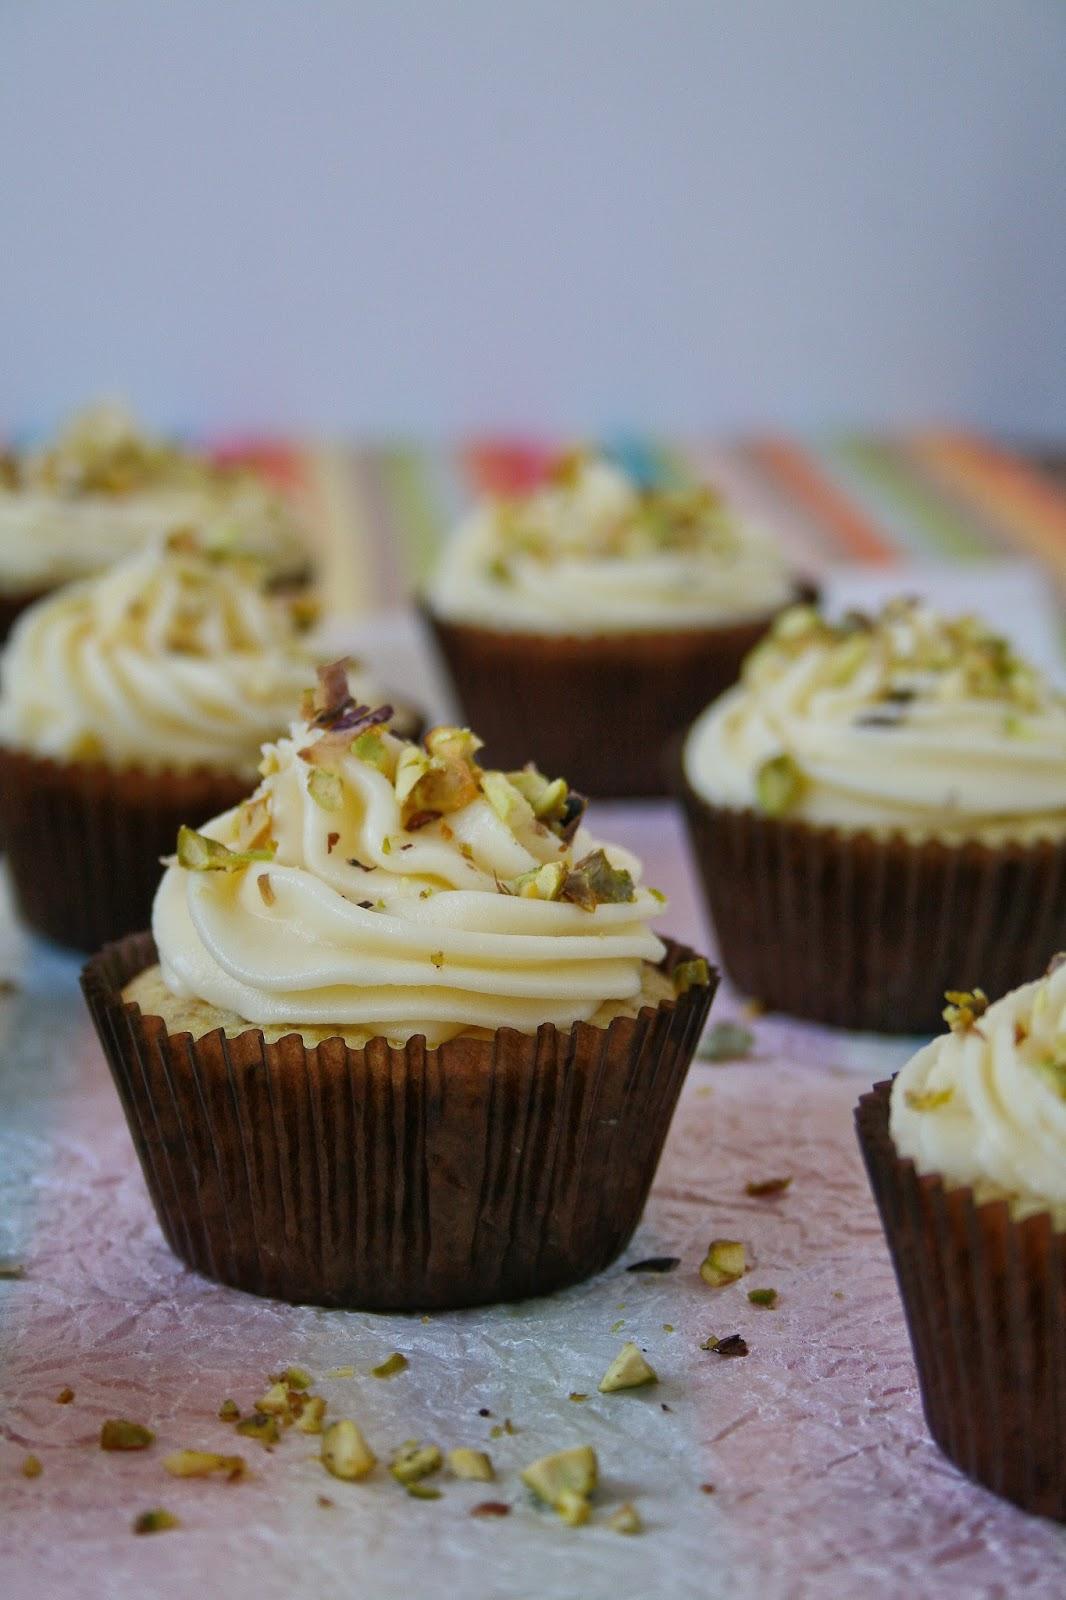 Easy lemon cupcakes with pistachios.